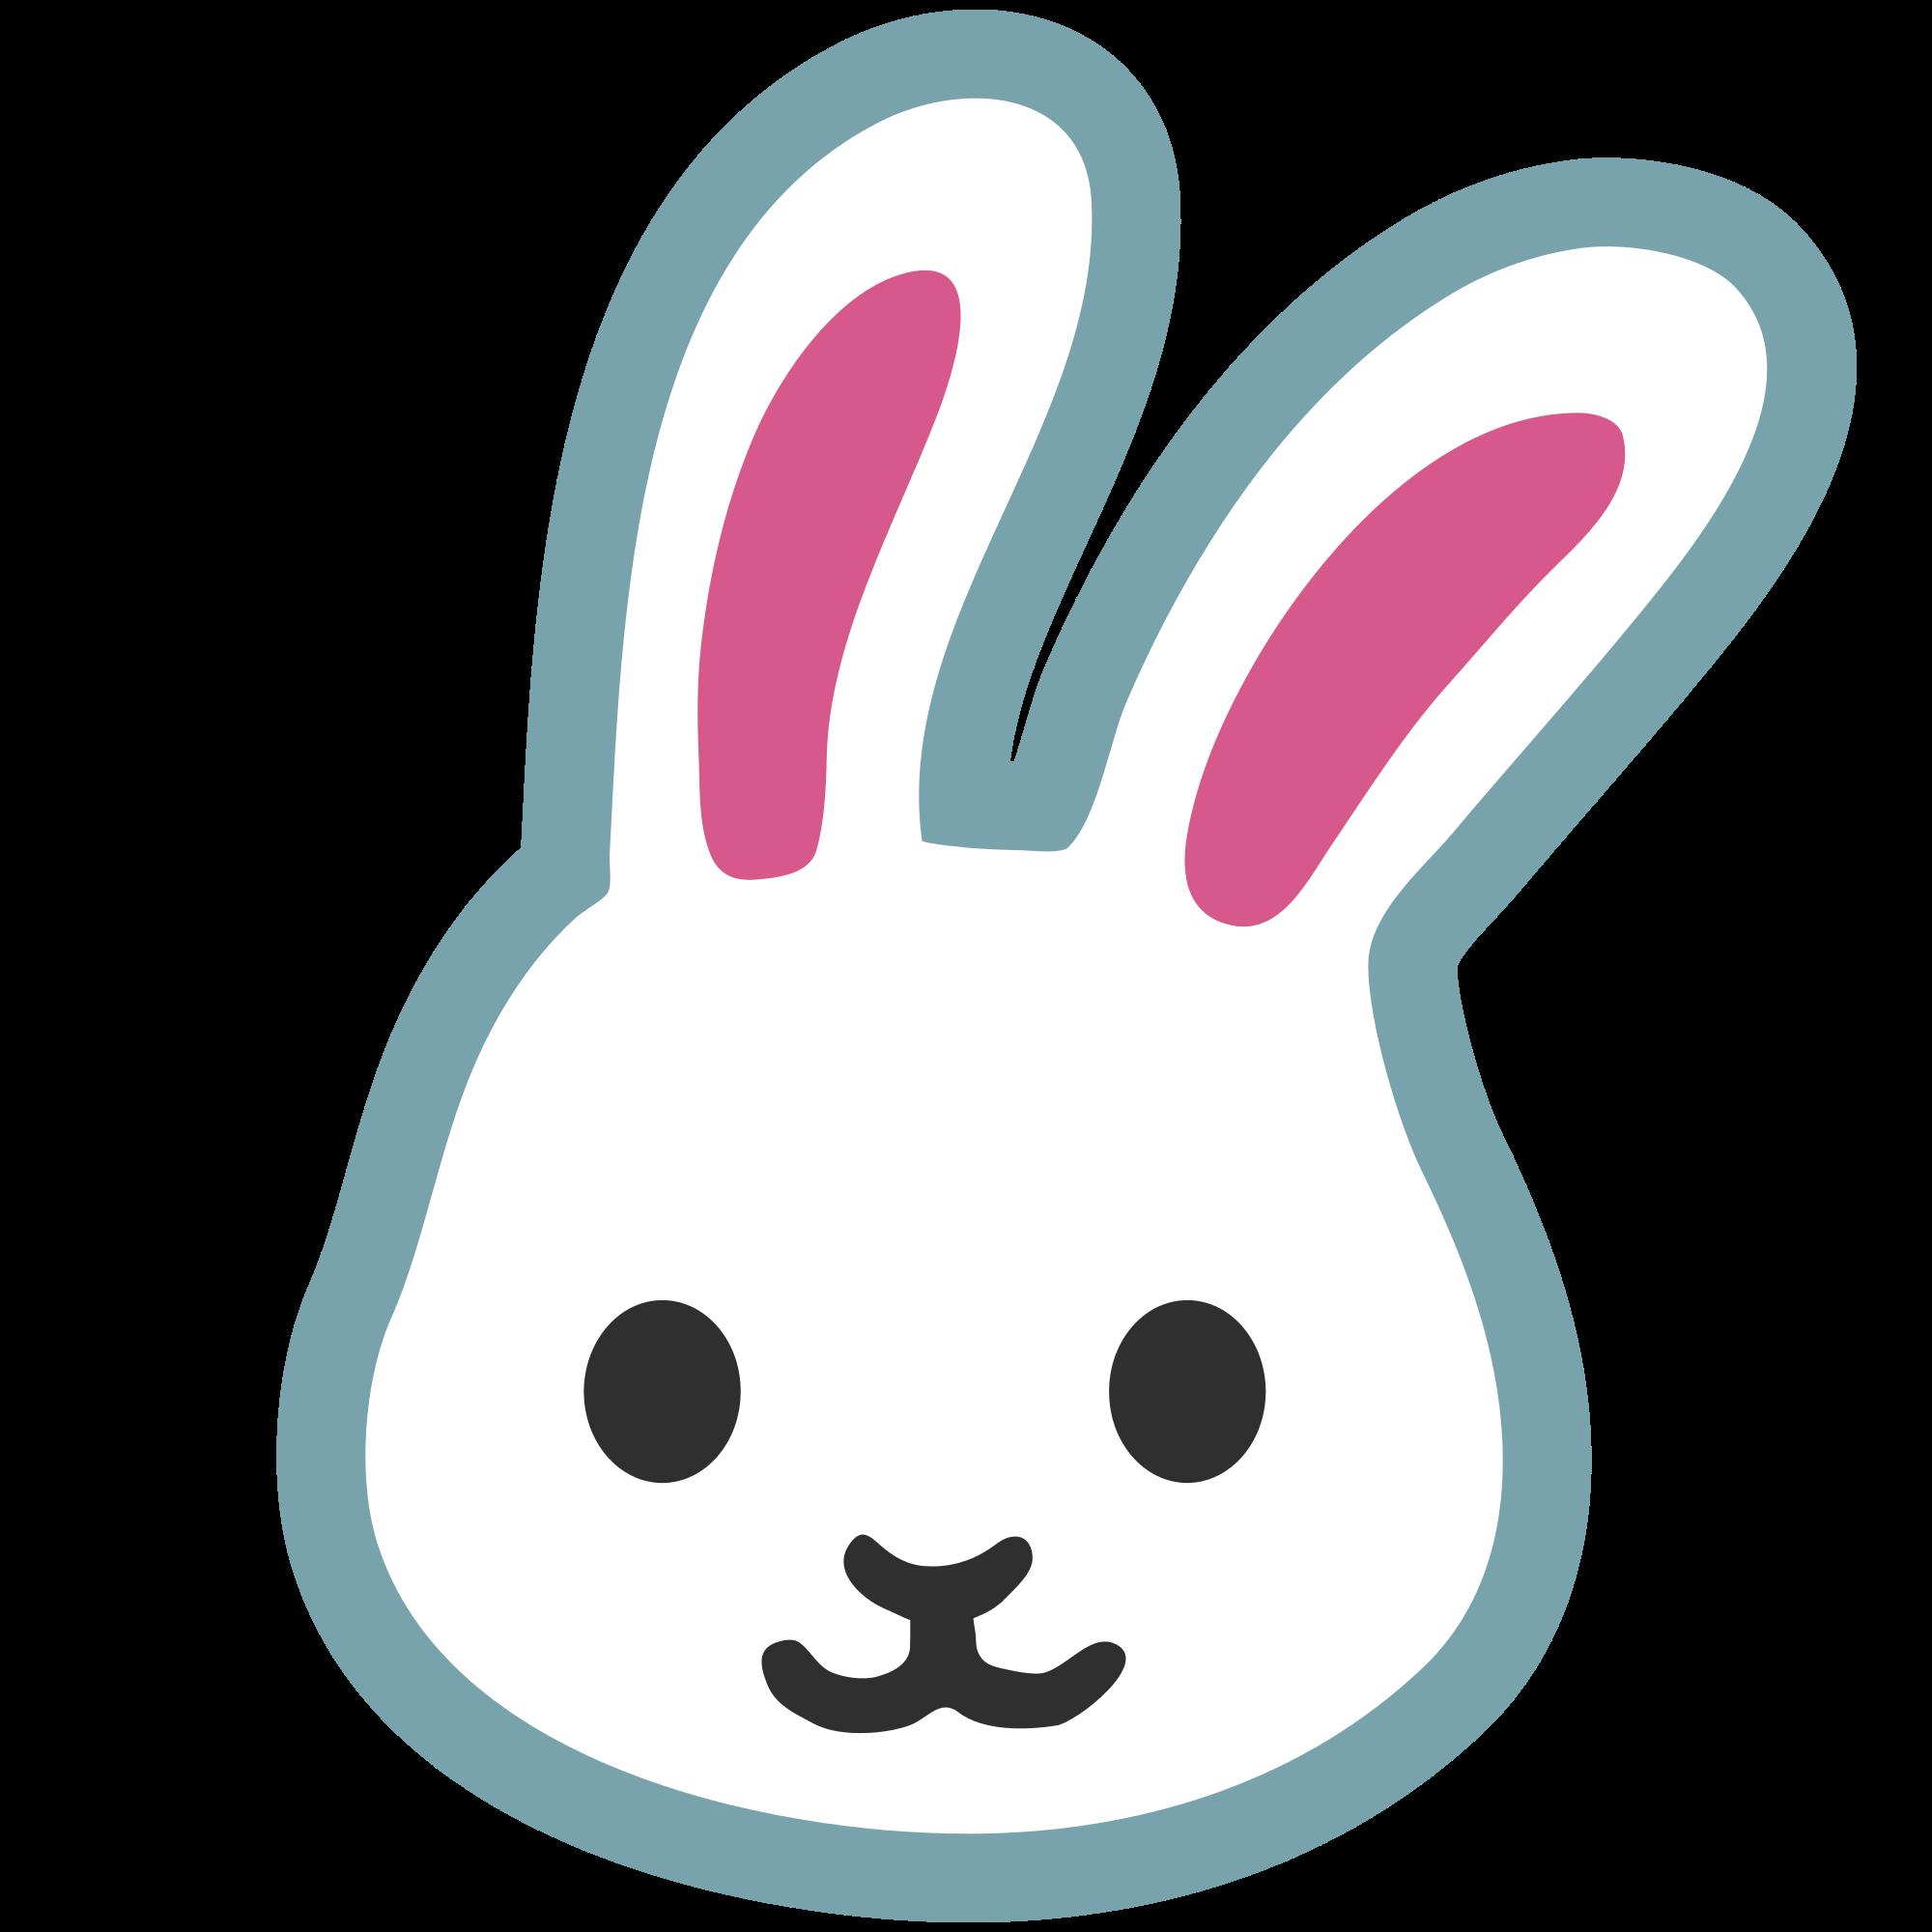 clip art free download  emoji png for. Vector emojis bunny